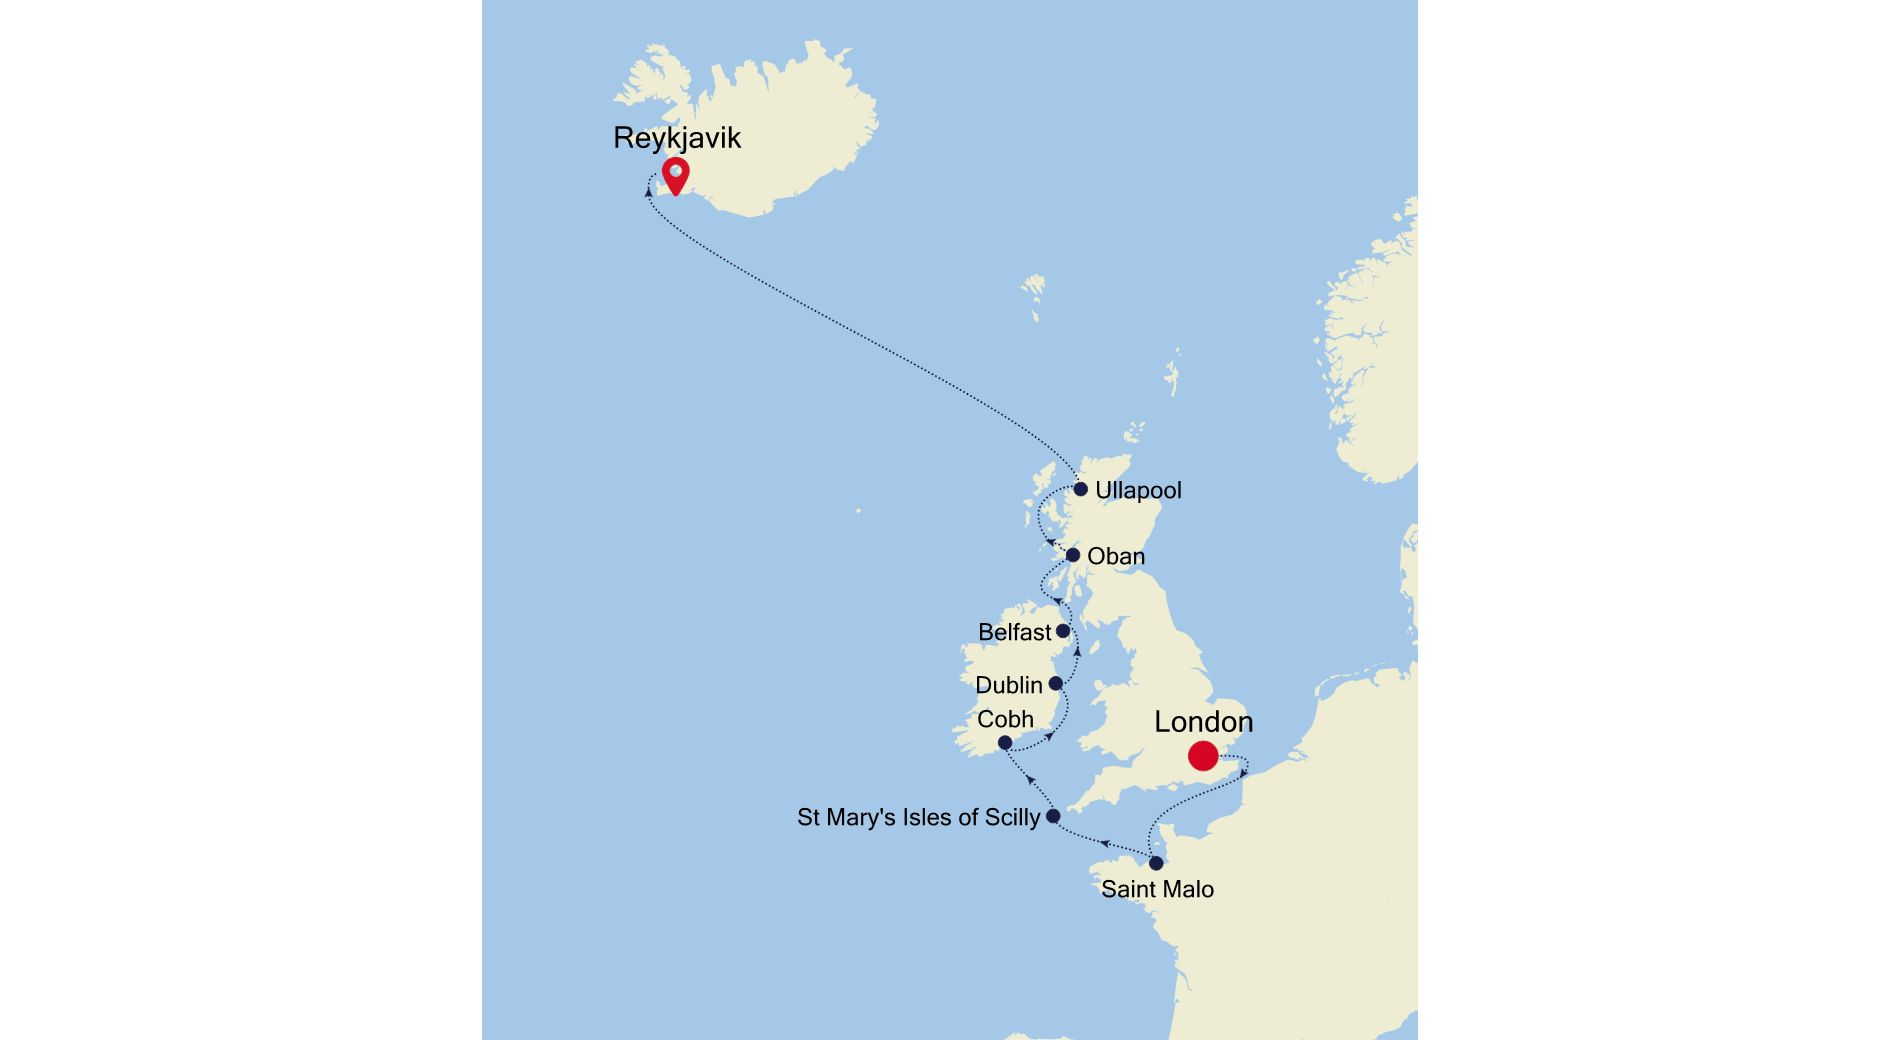 2921 - London nach Reykjavik